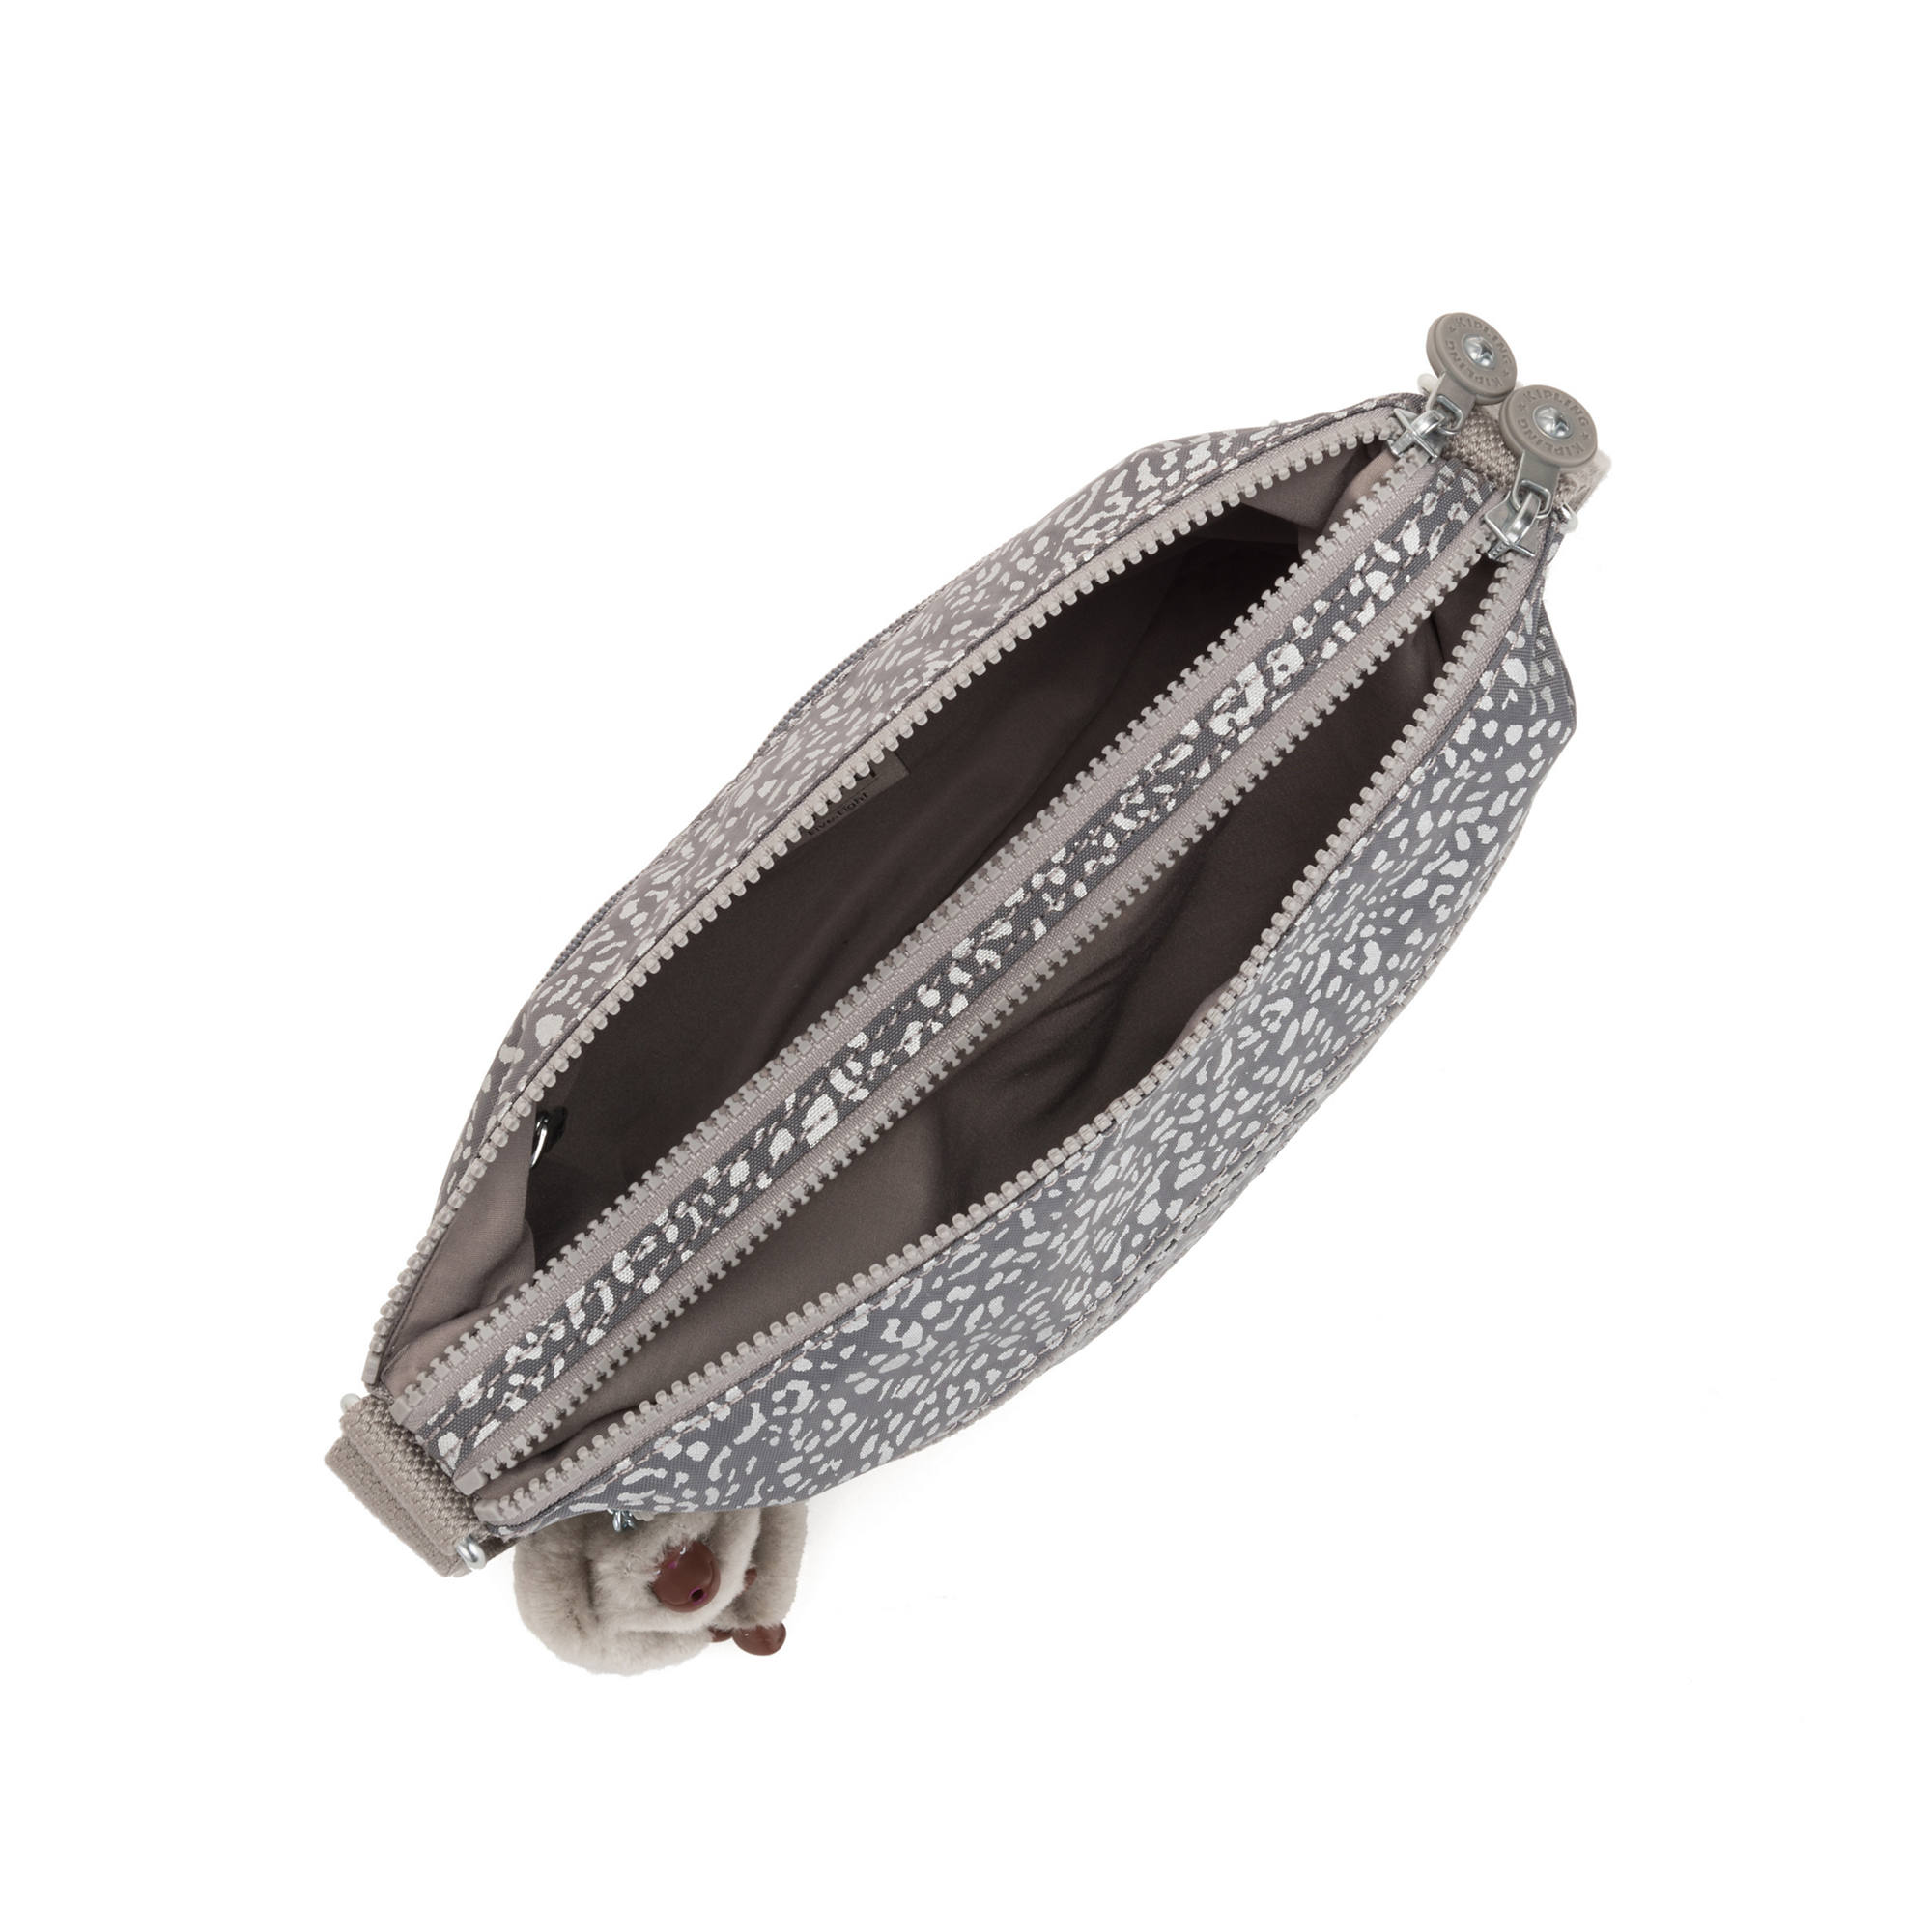 Kipling-Alvar-Metallic-Crossbody-Bag miniature 33